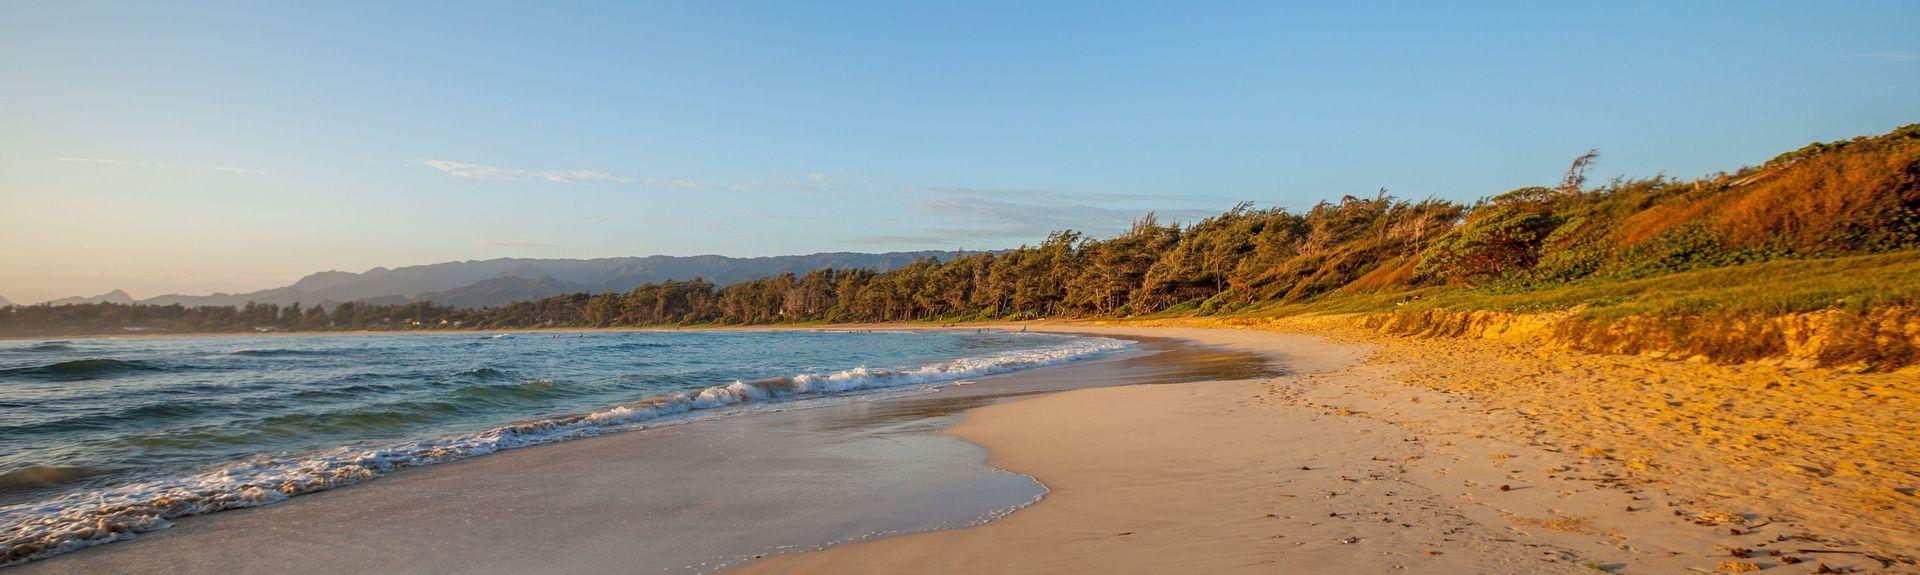 Malaekahana Beach, Hawaii, United States of America